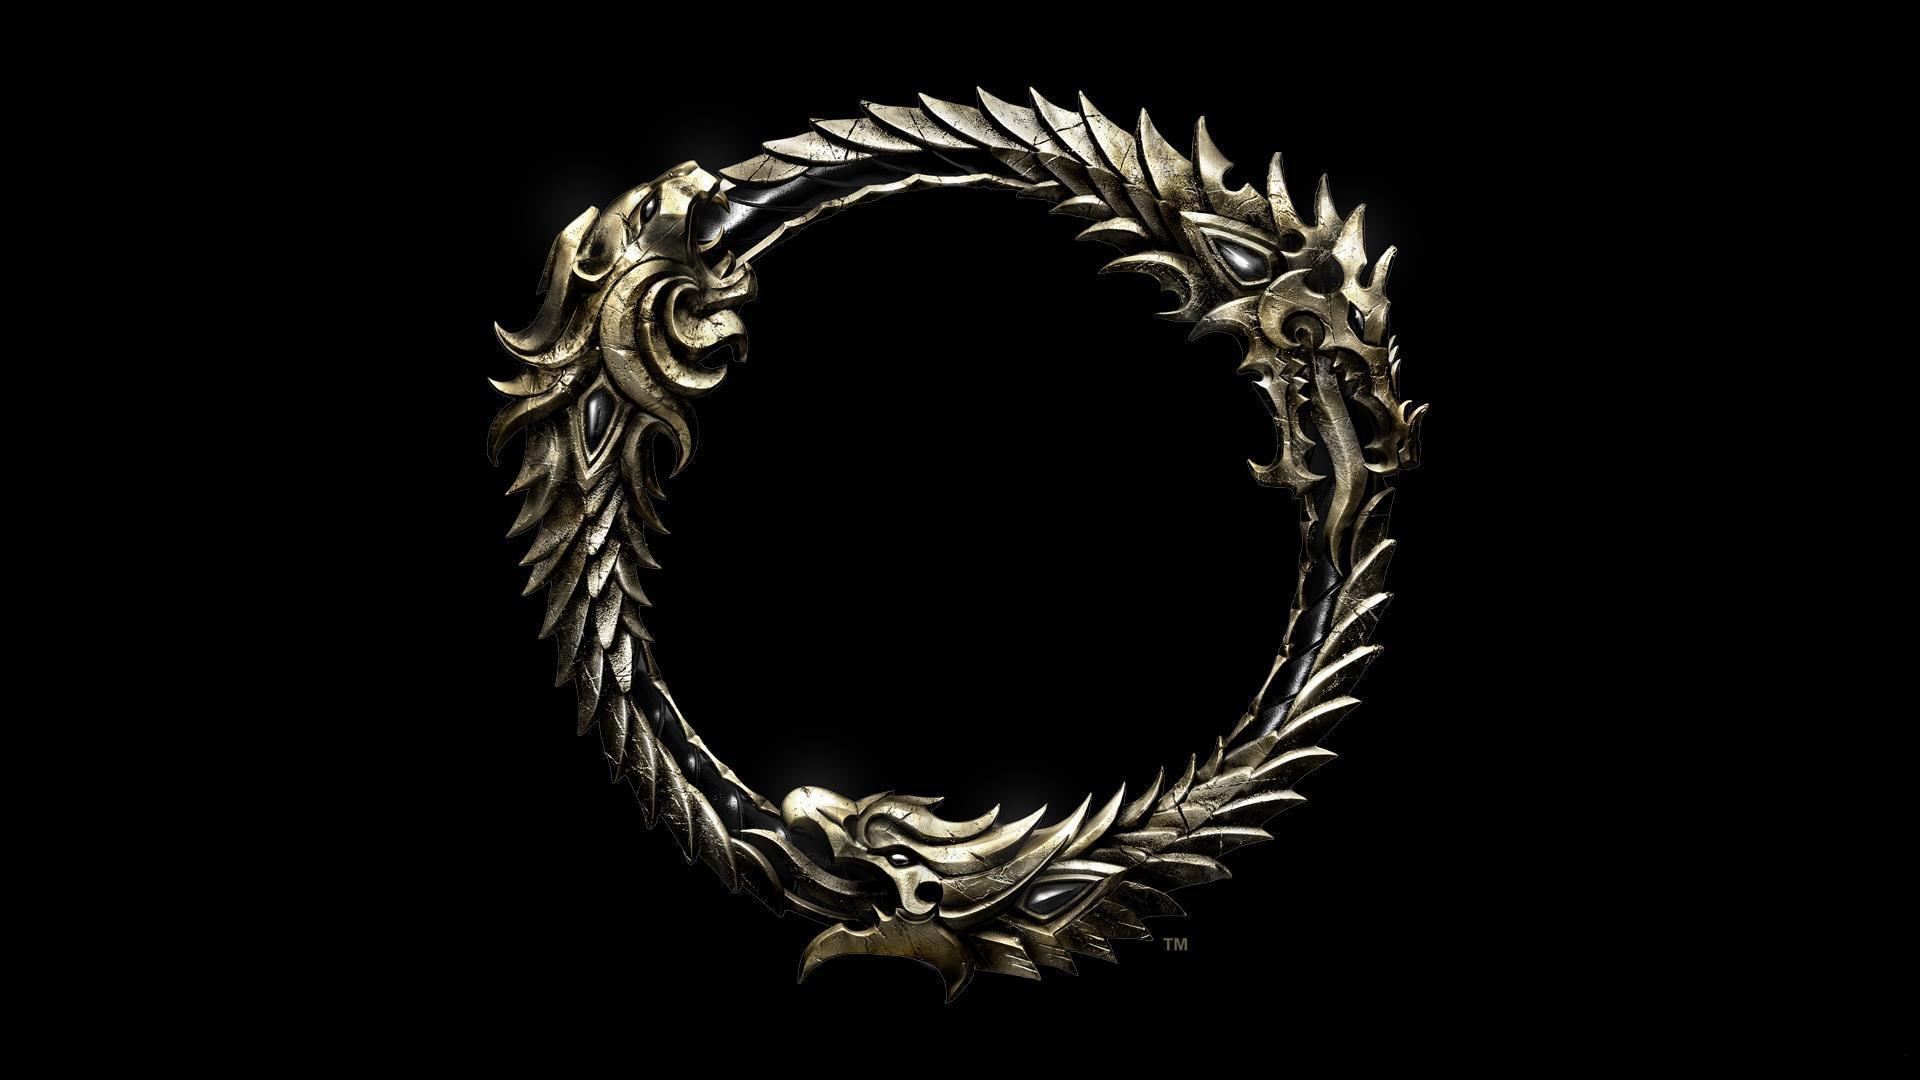 the-elder-scrolls-online-logo-wallpaper.jpg